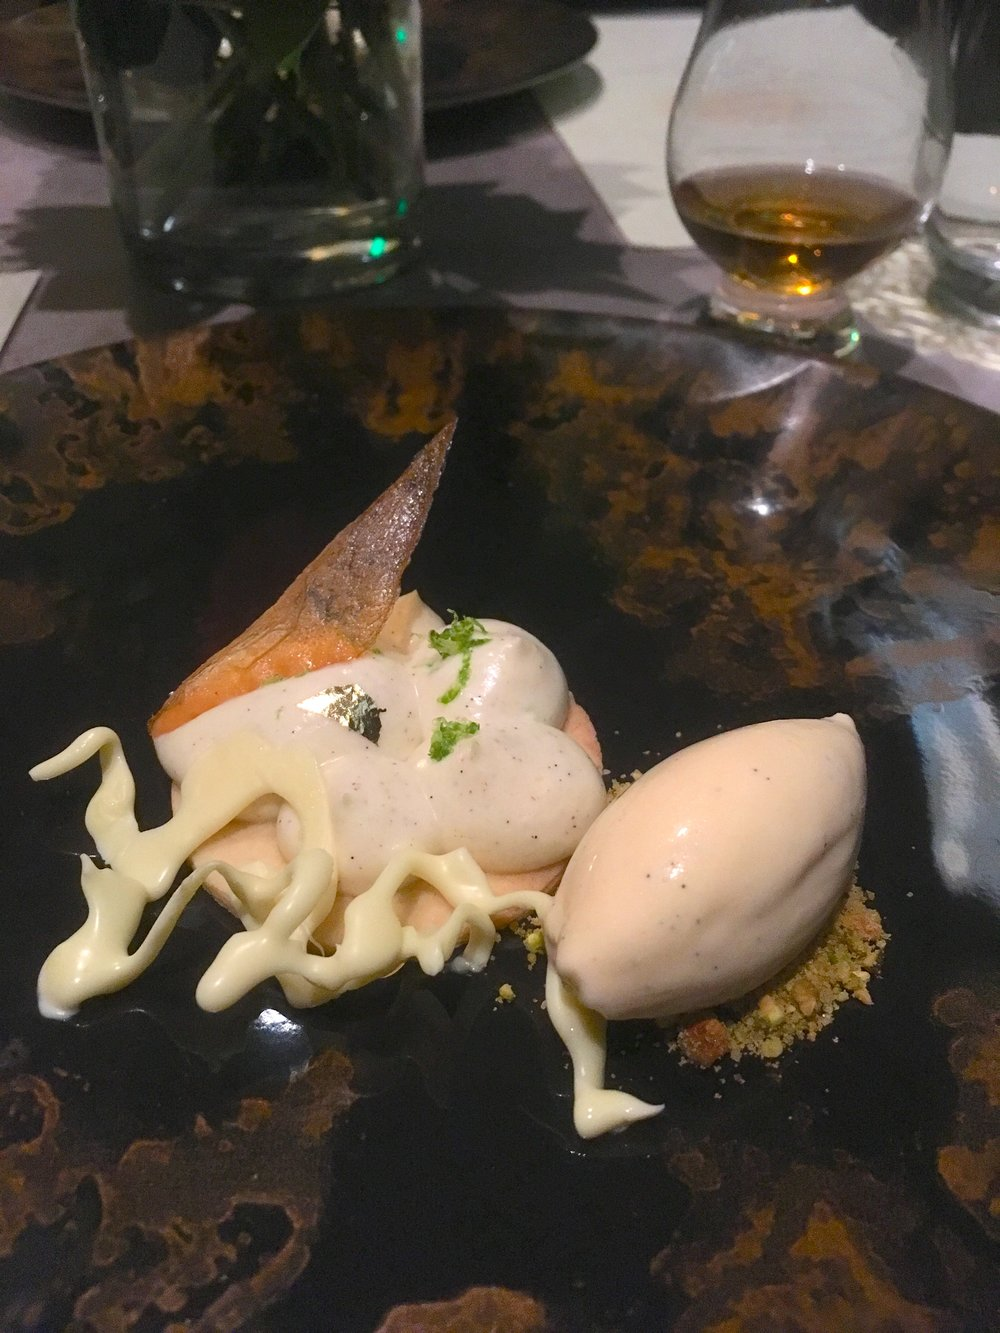 Bonus Dessert!